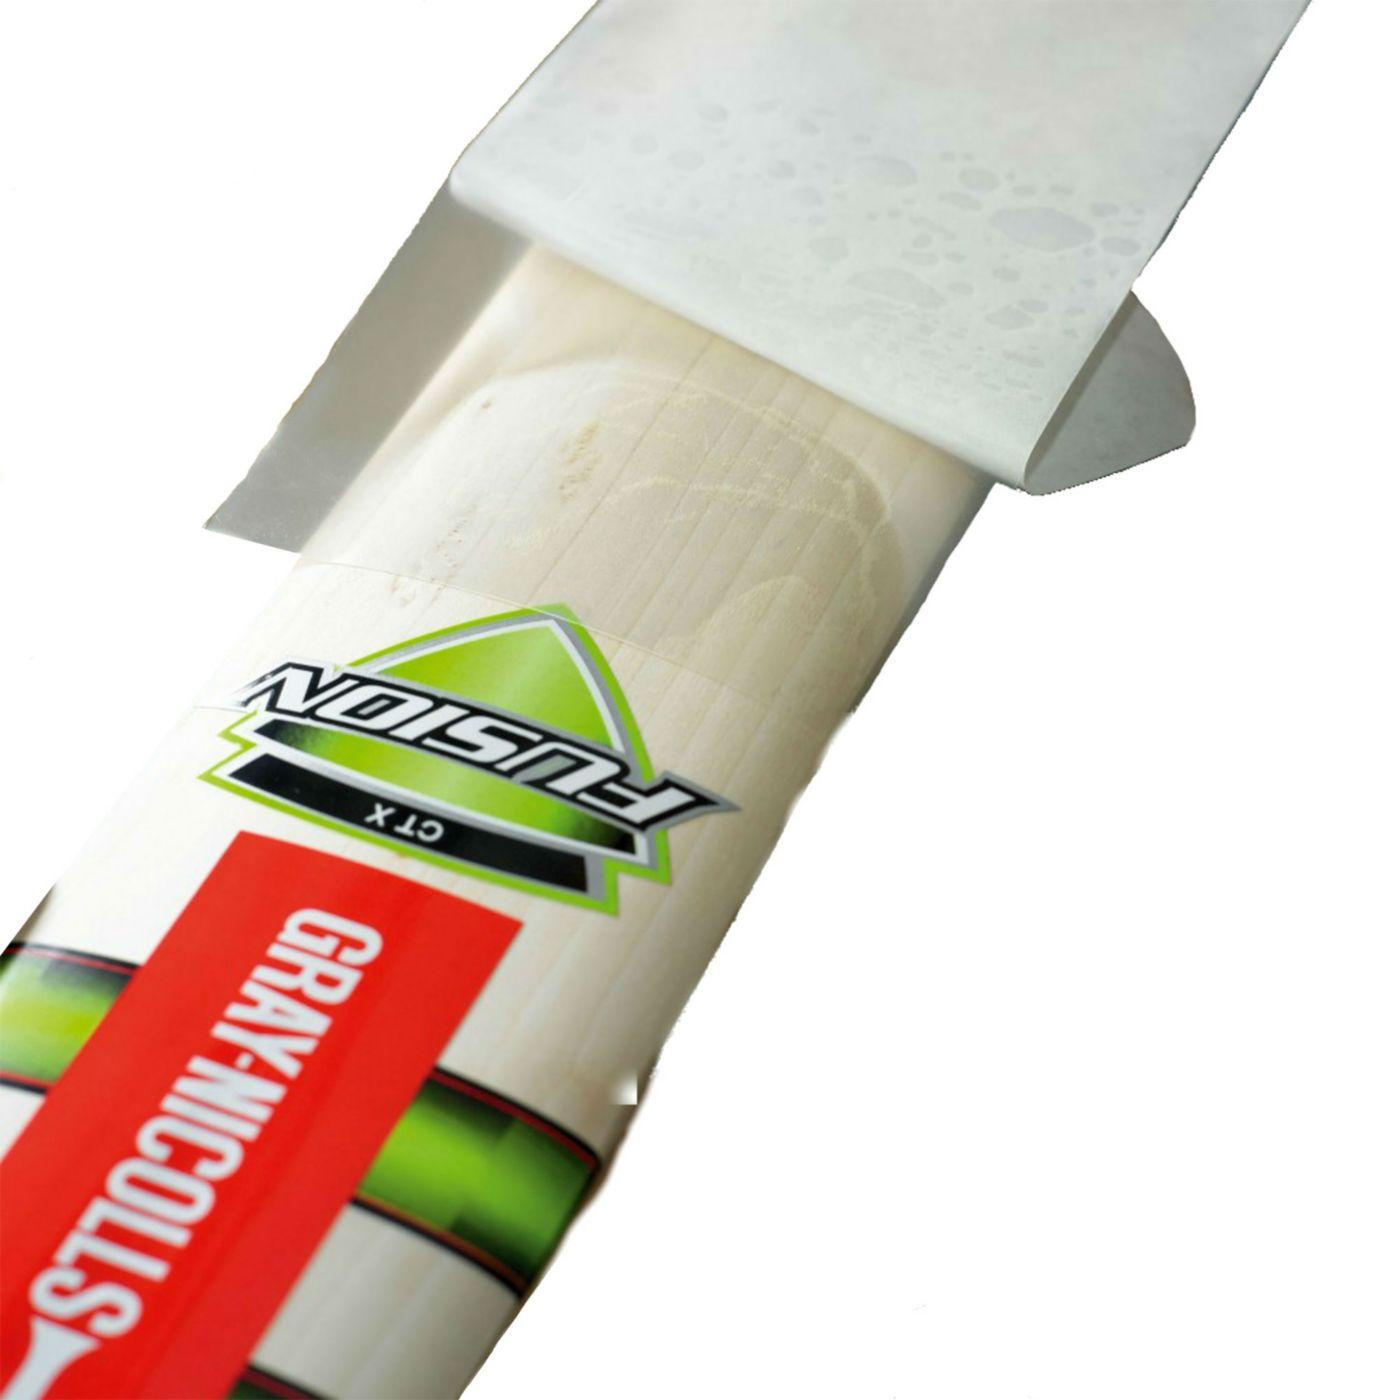 Gray Nicolls Cricket Bat Face Extratec